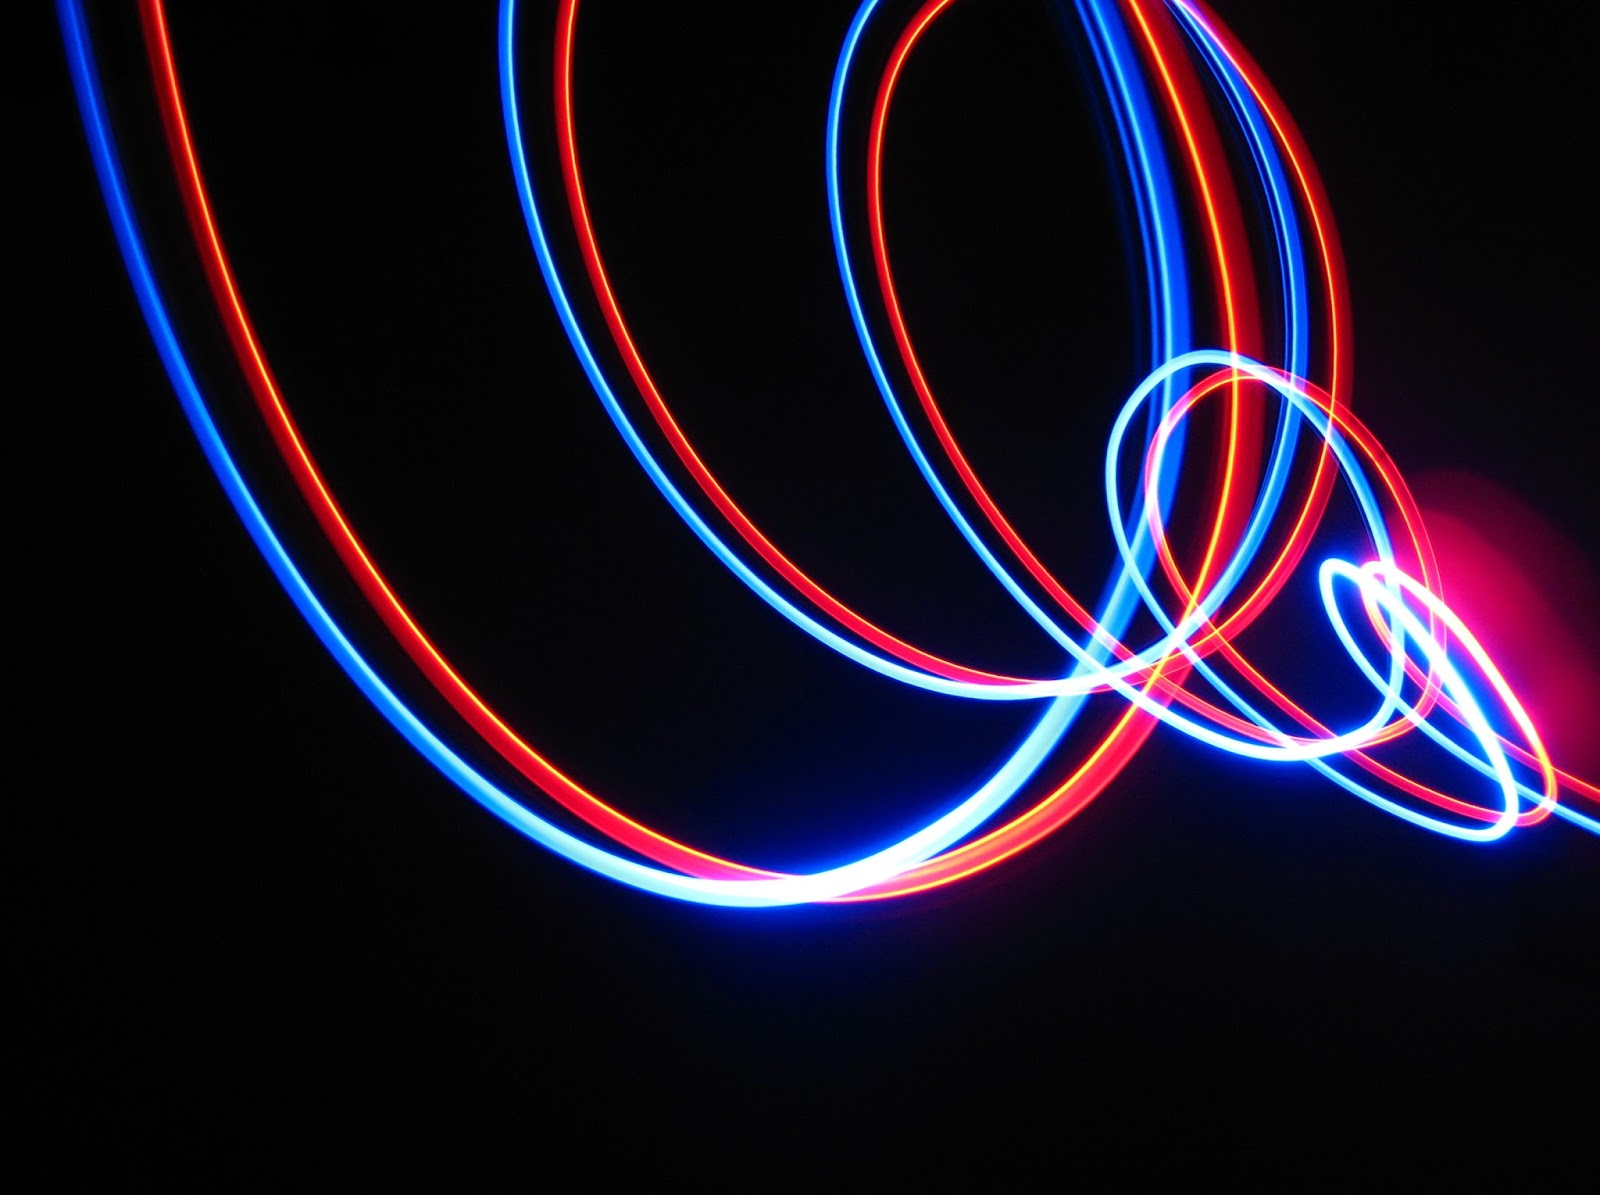 Neon HD Wallpaper Free Download - Neon Lights